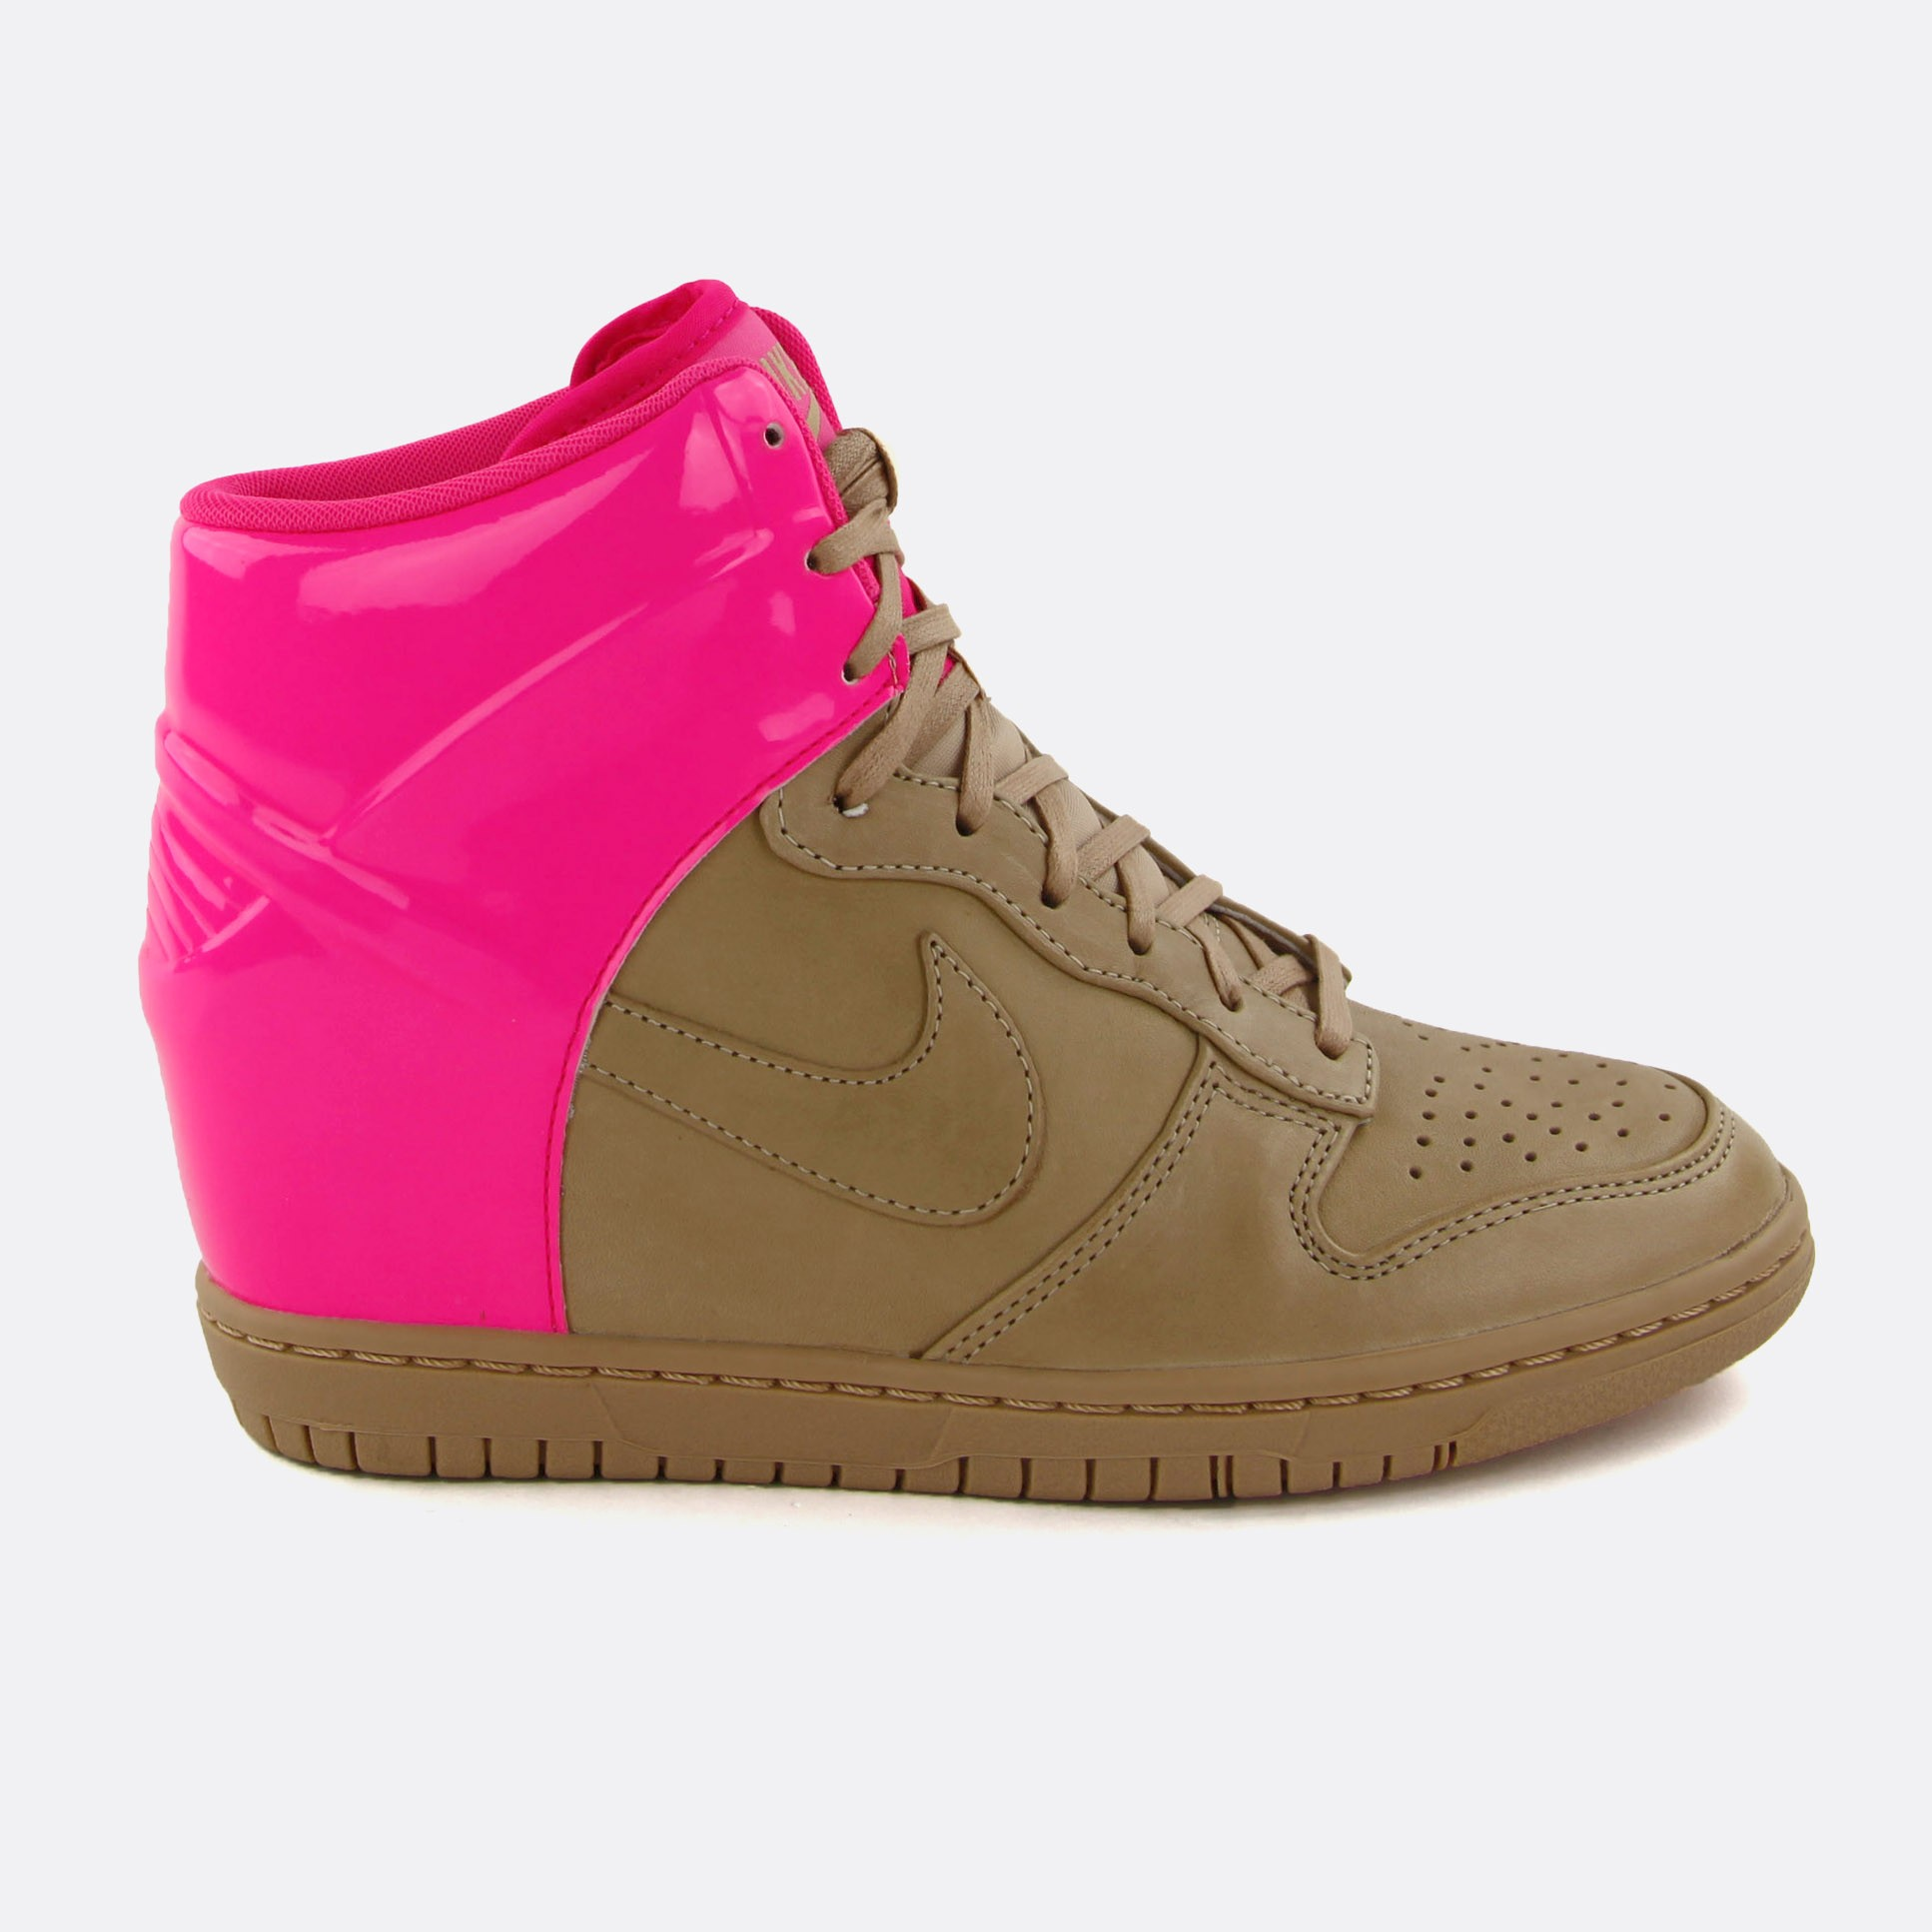 Sepatu Nike Dunk Sky Hi - Musée des impressionnismes Giverny 51cd9ce97b